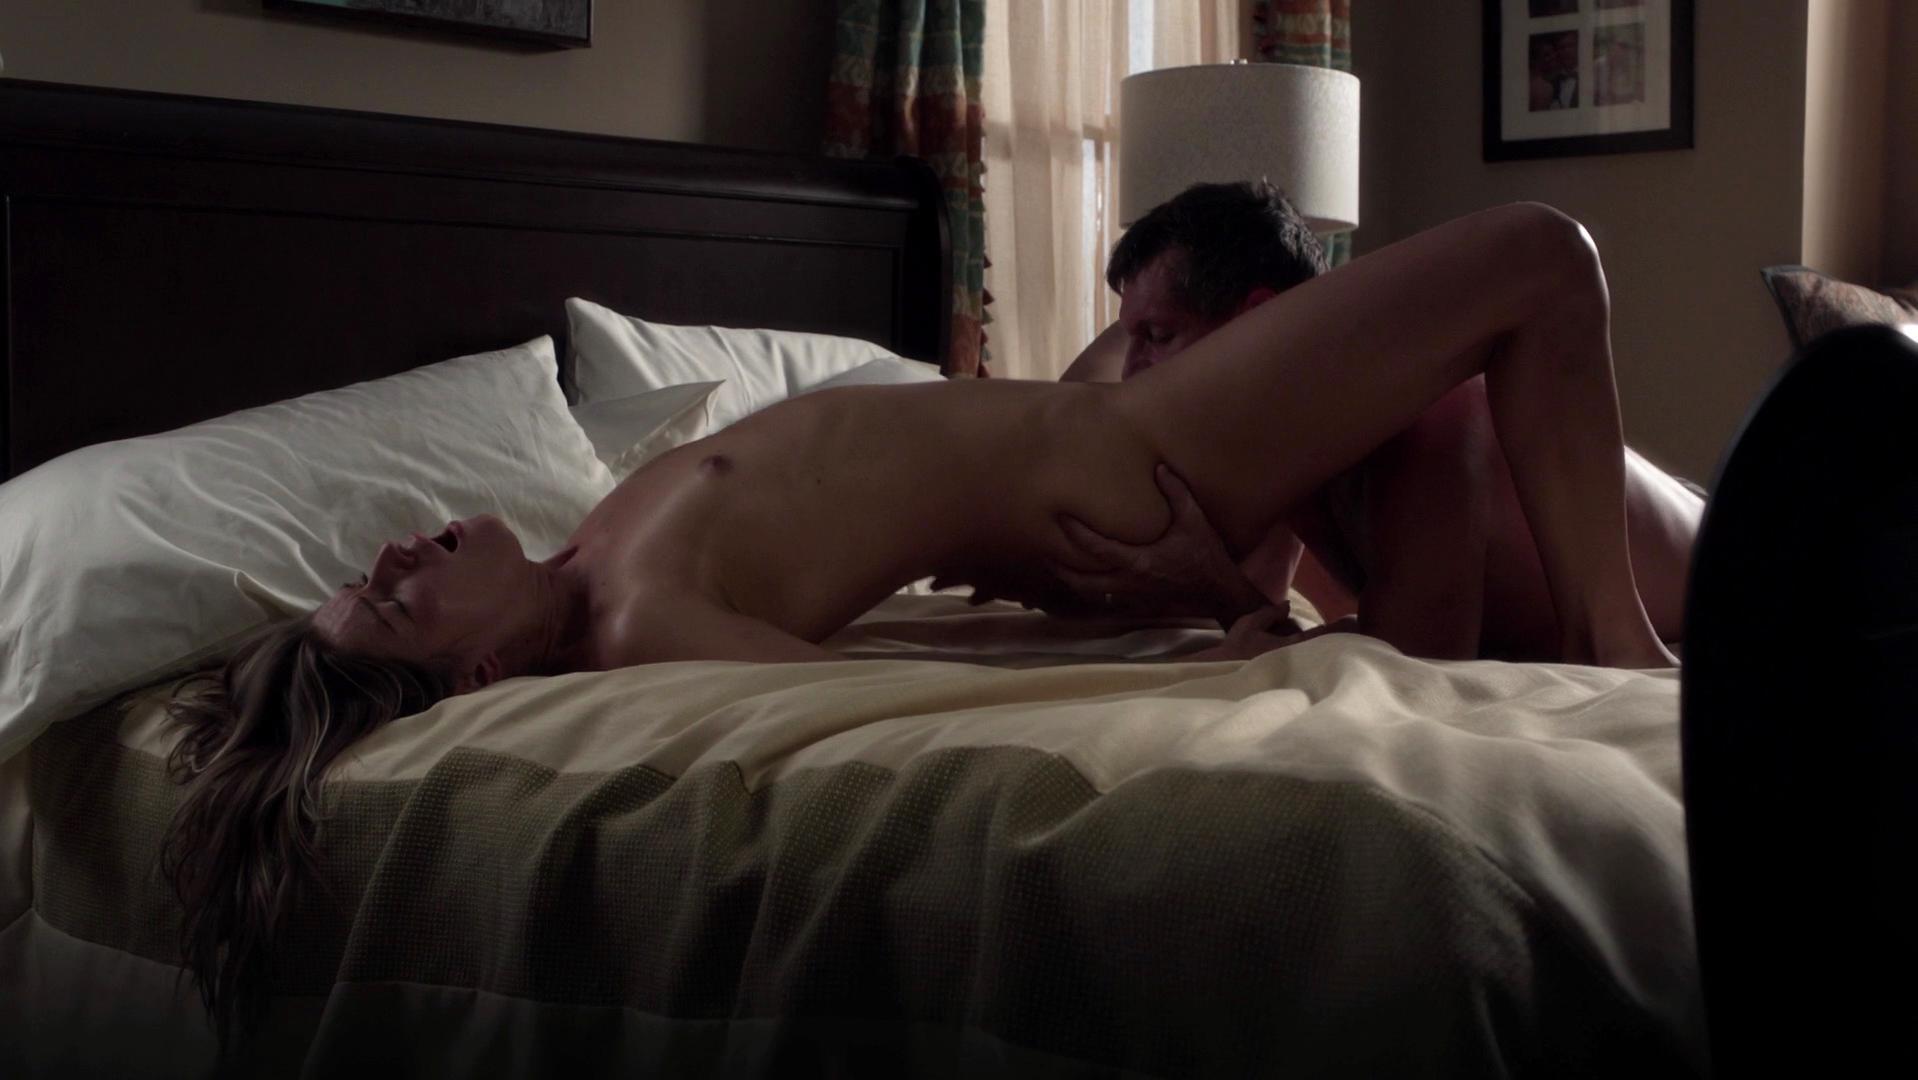 Ivana milicevic nude banshee